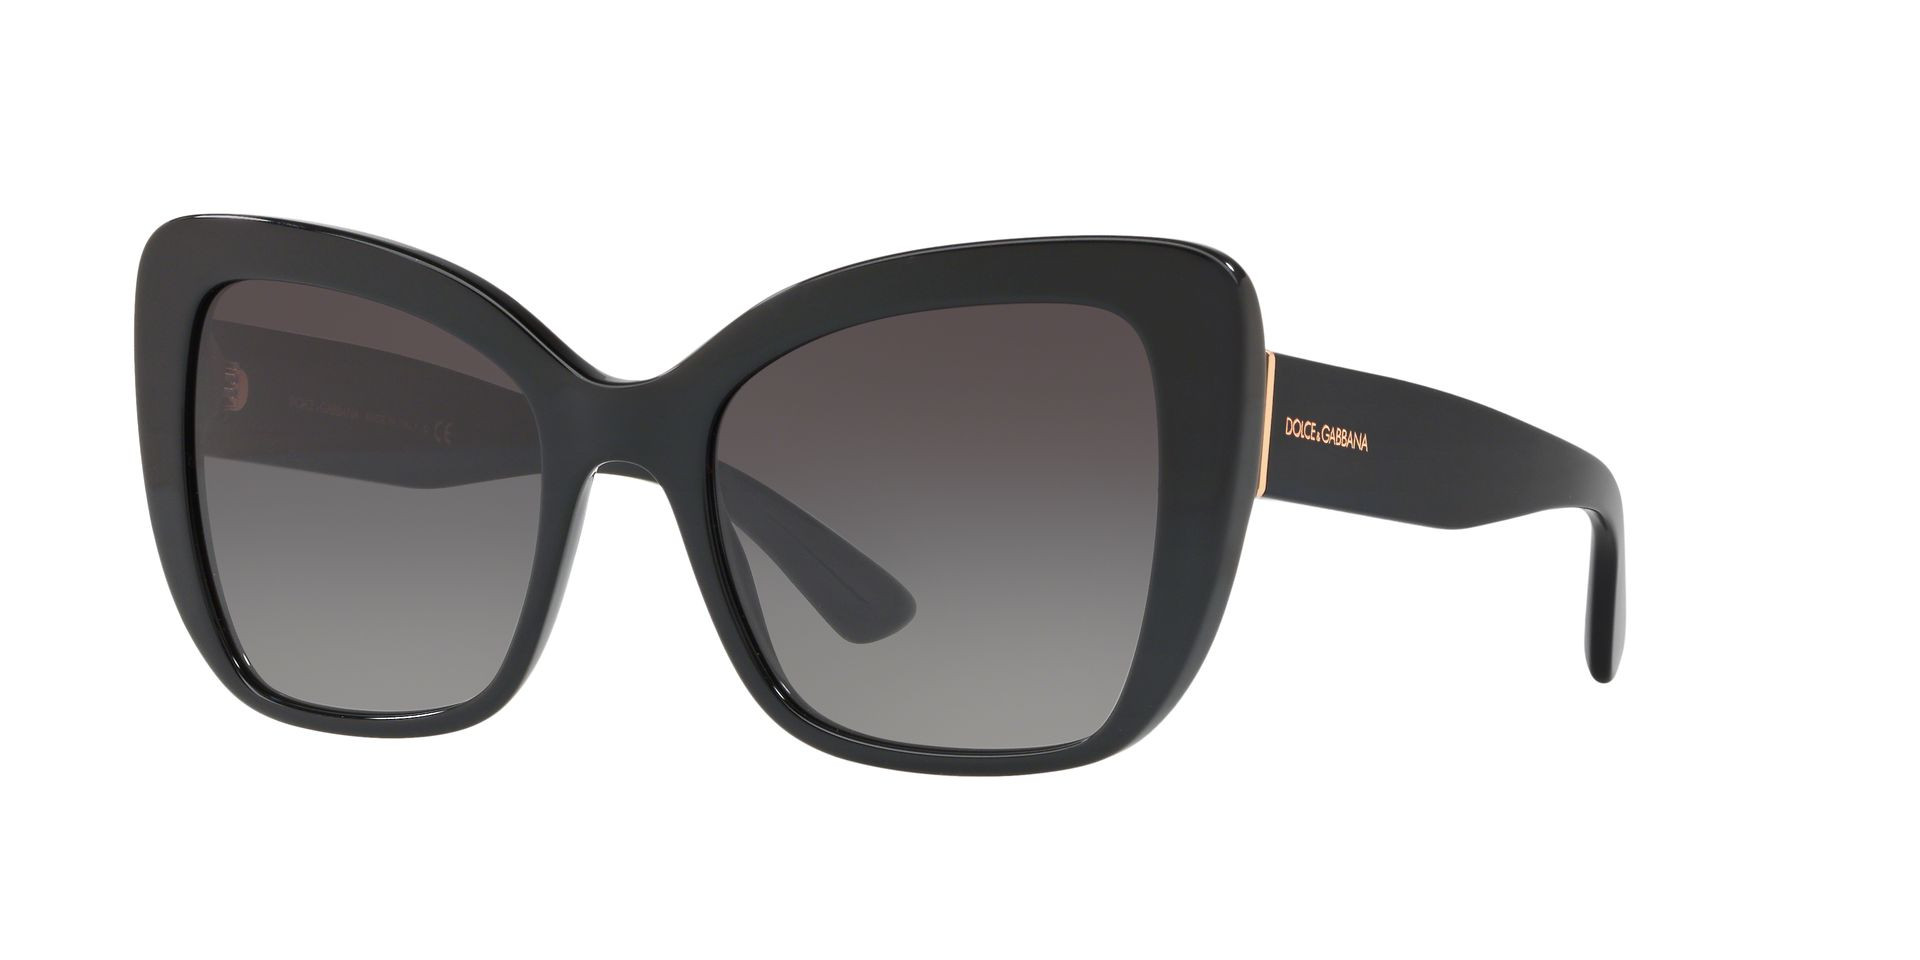 Gafas de sol DOLCE & GABBANA DG 4348 501/8G